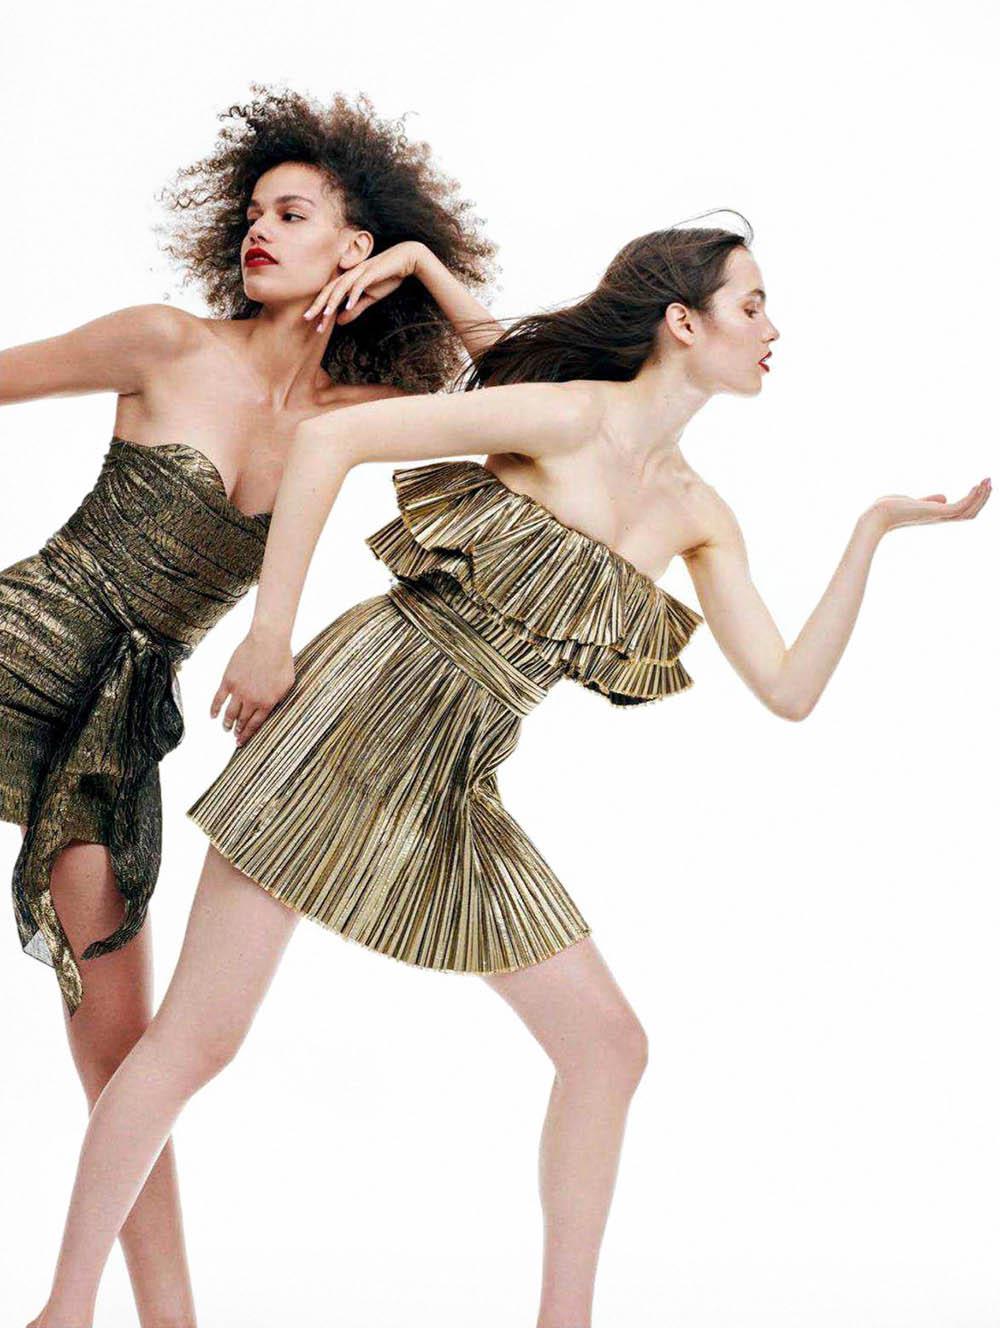 ''Días De Fiesta'' by Bjorn Iooss for Vogue Spain July 2018